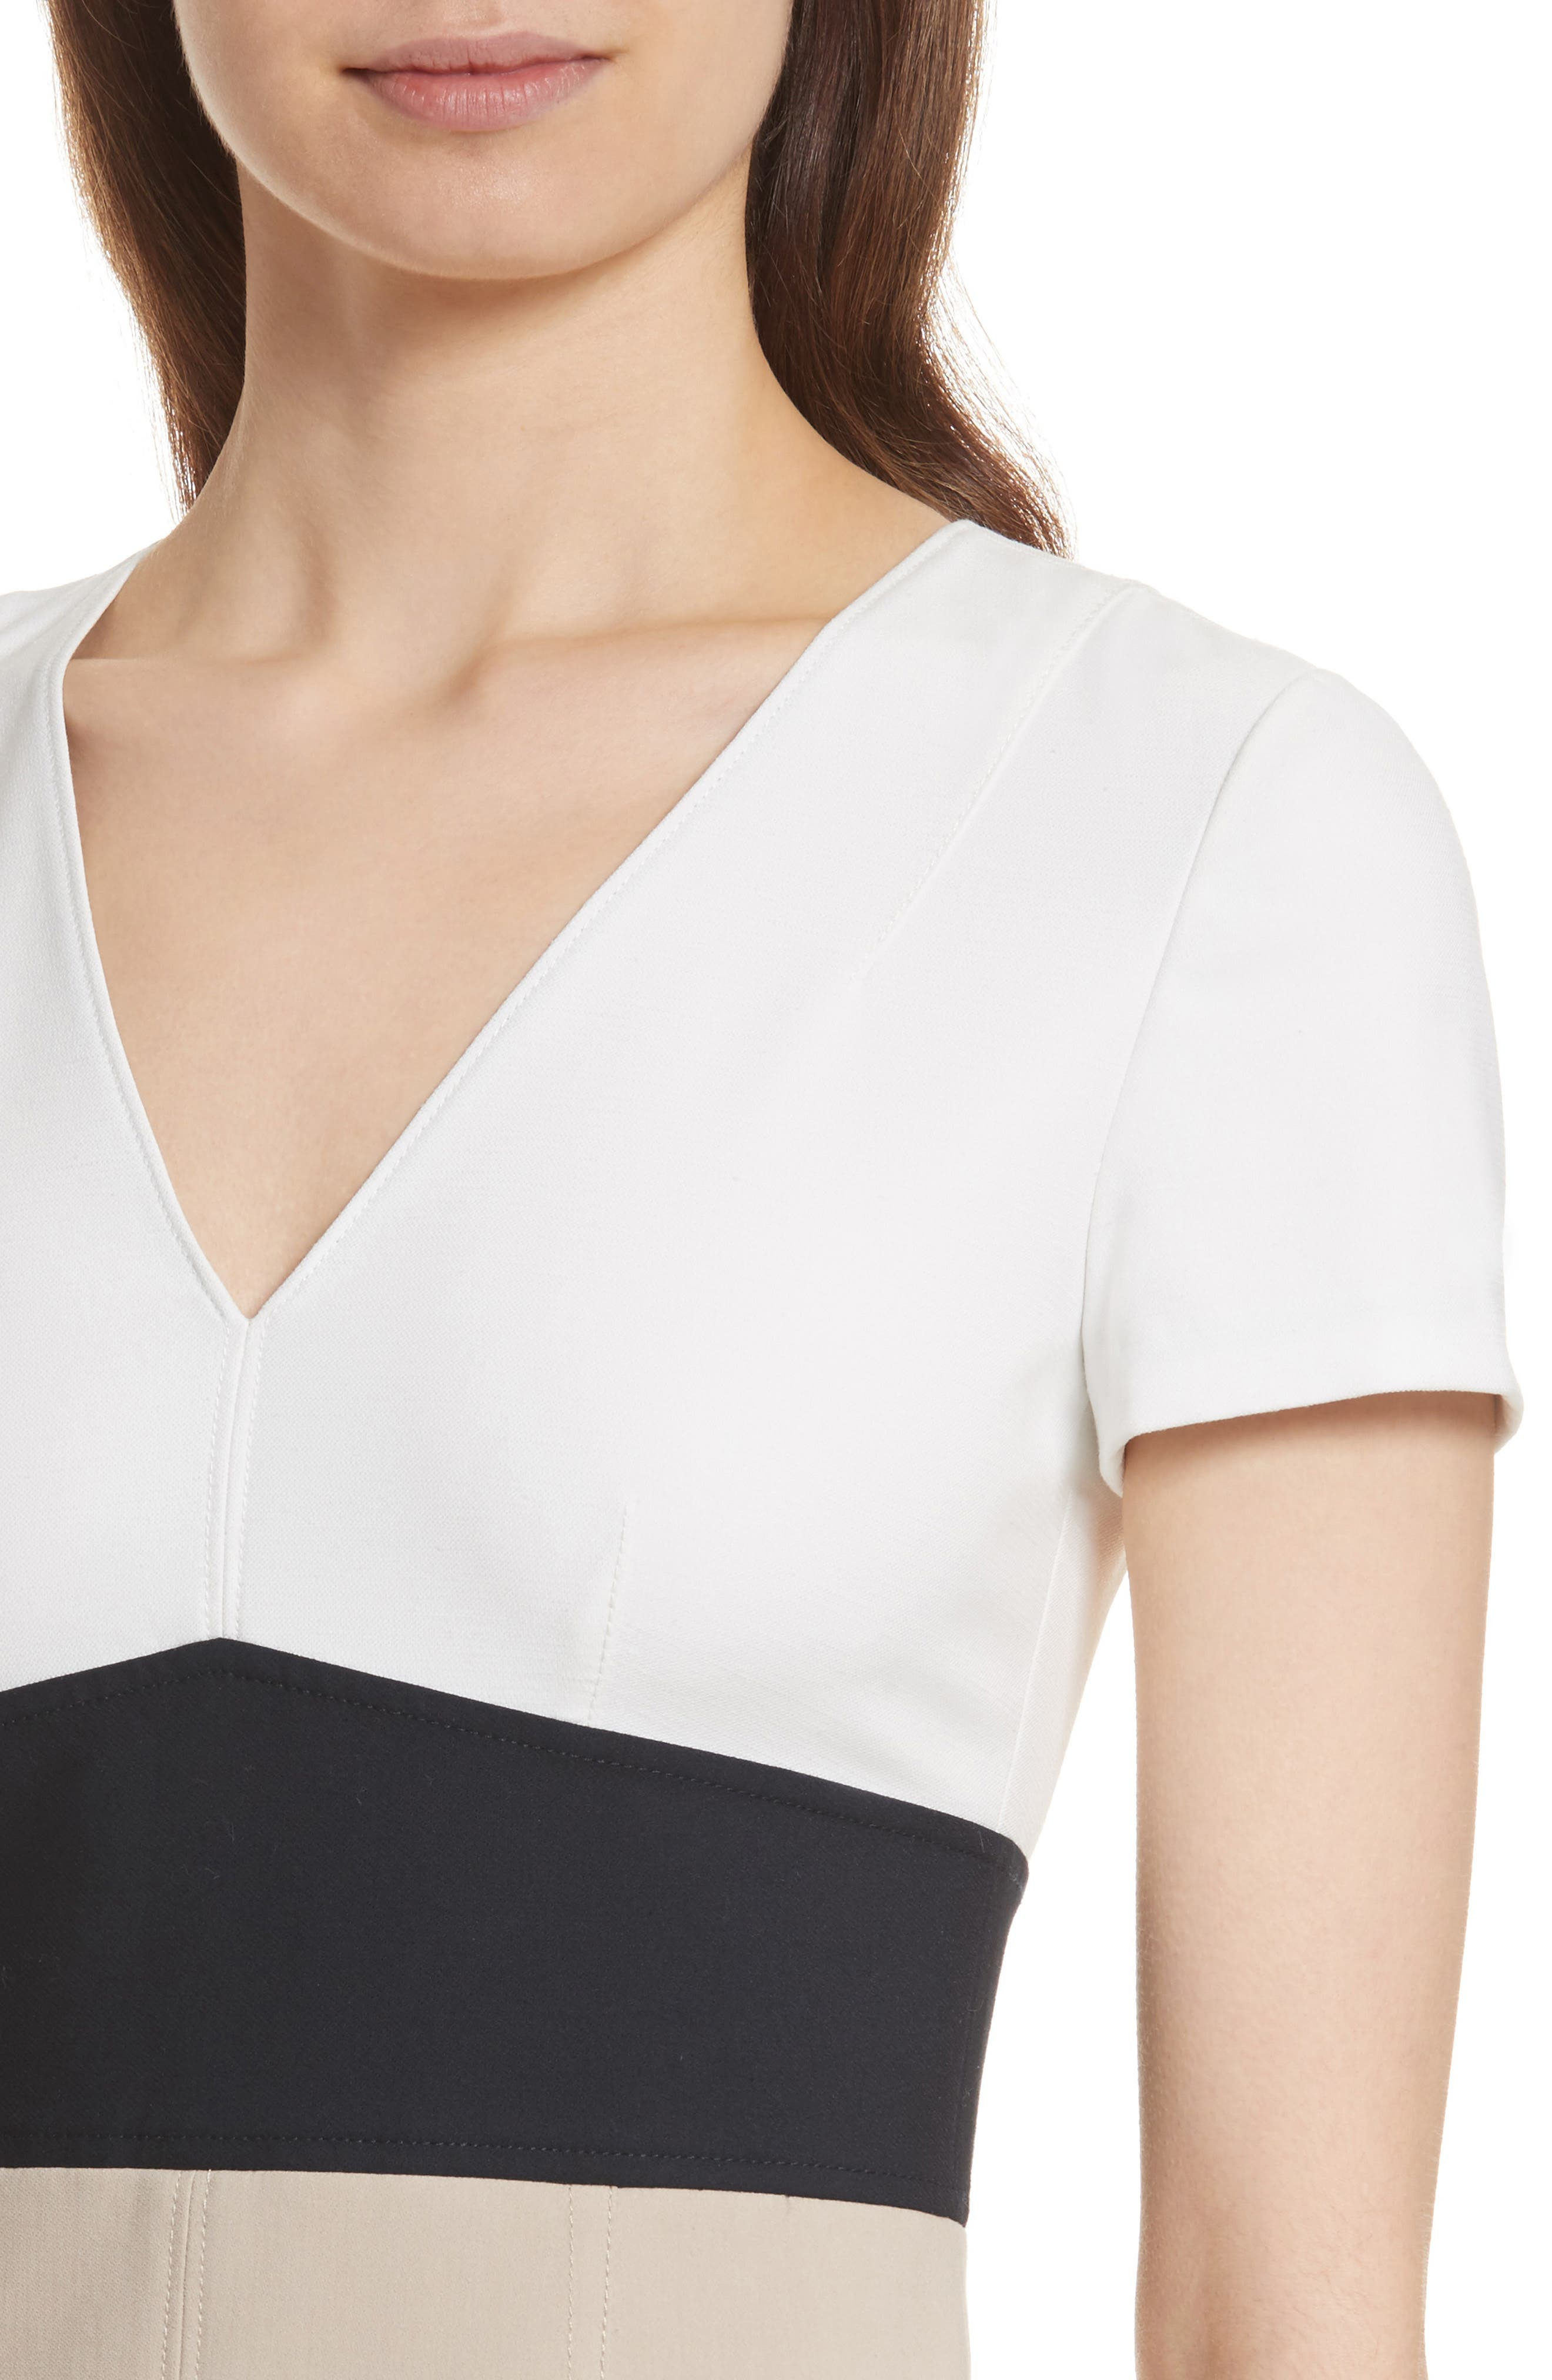 Diane von Furstenberg Colorblock Stretch Cotton Blend Sheath Dress,                             Alternate thumbnail 4, color,                             Sand/ Alexander Navy/ White